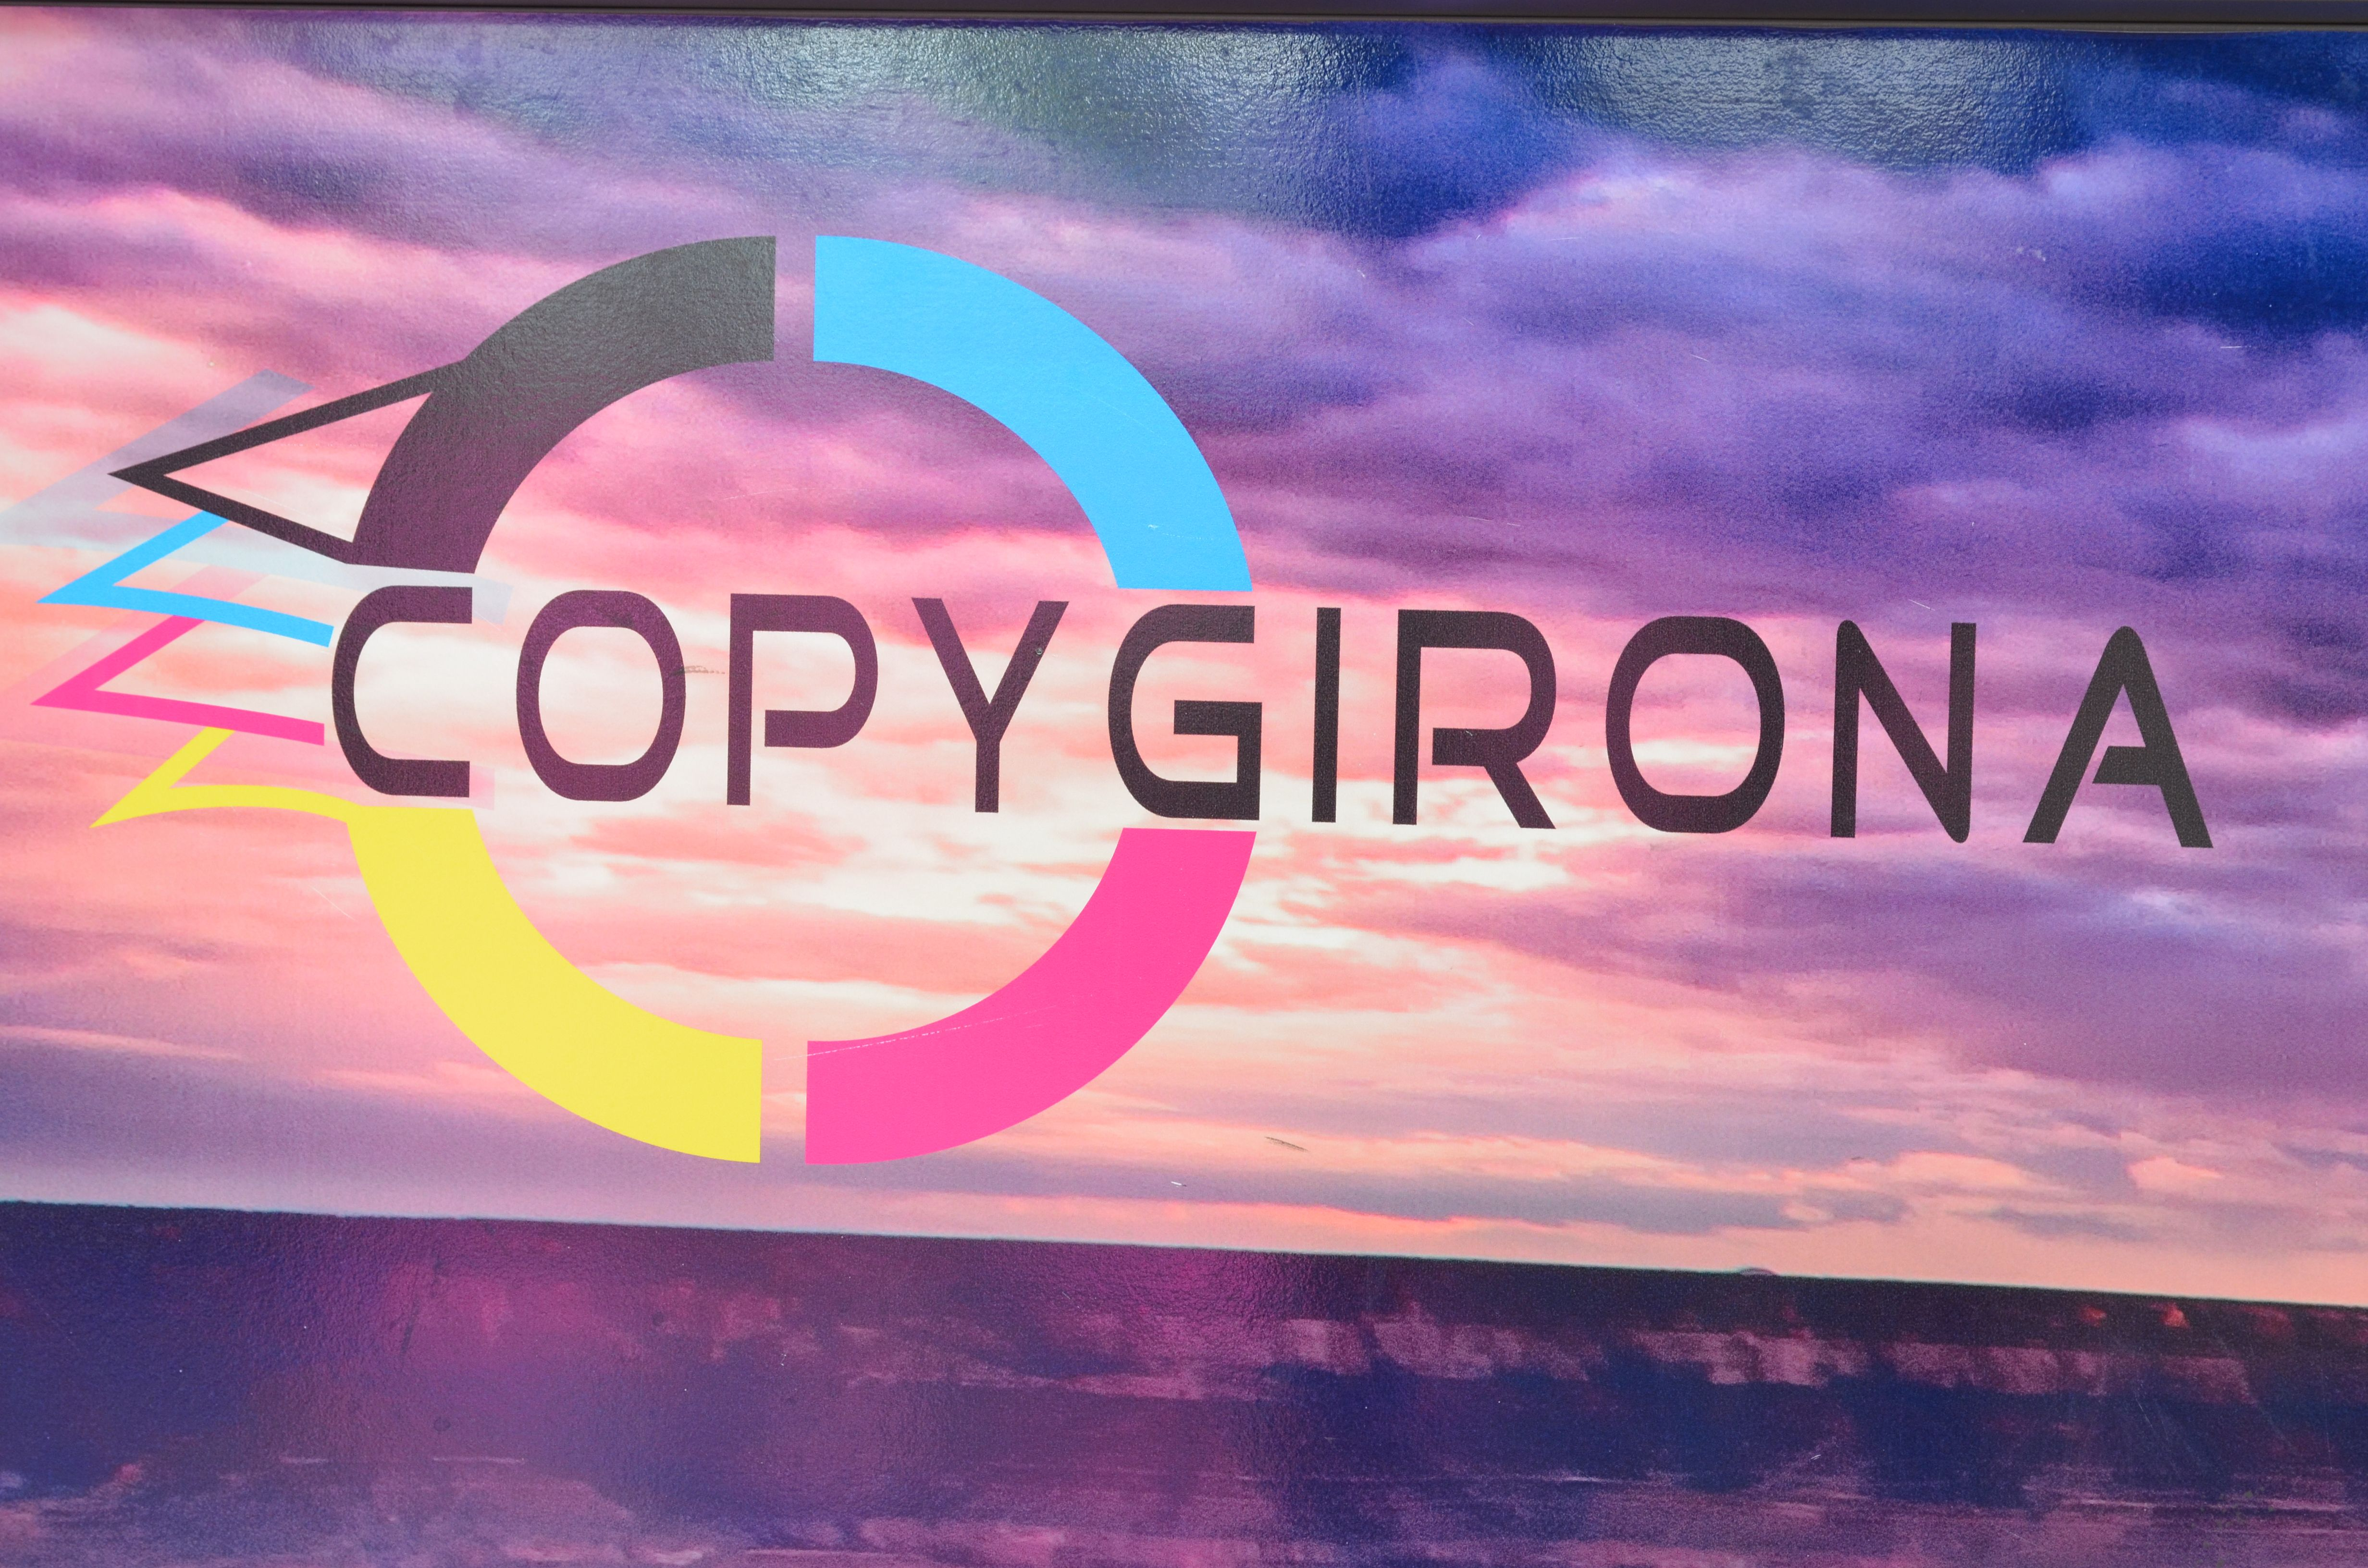 Foto 3 de Fotocopias en Girona | Copygirona